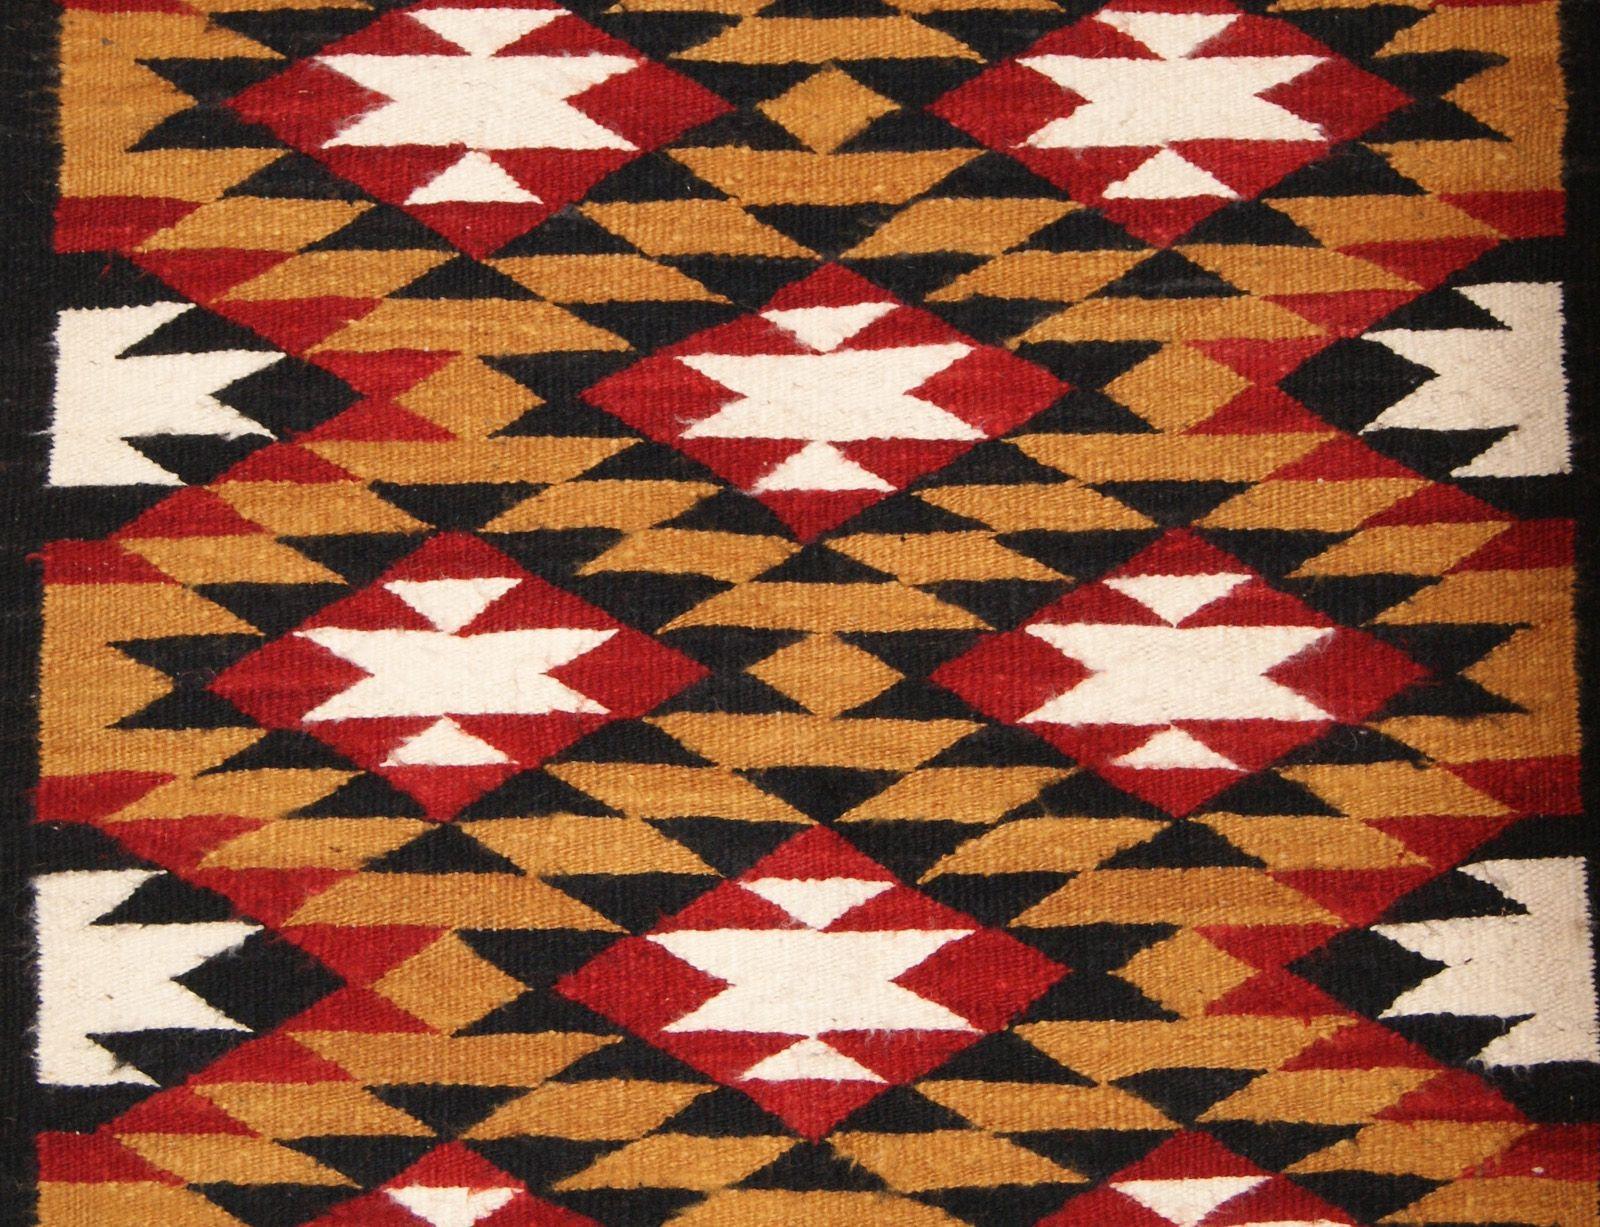 Navajo Double Saddle Blanket Kilims, Rugs & Carpets ...